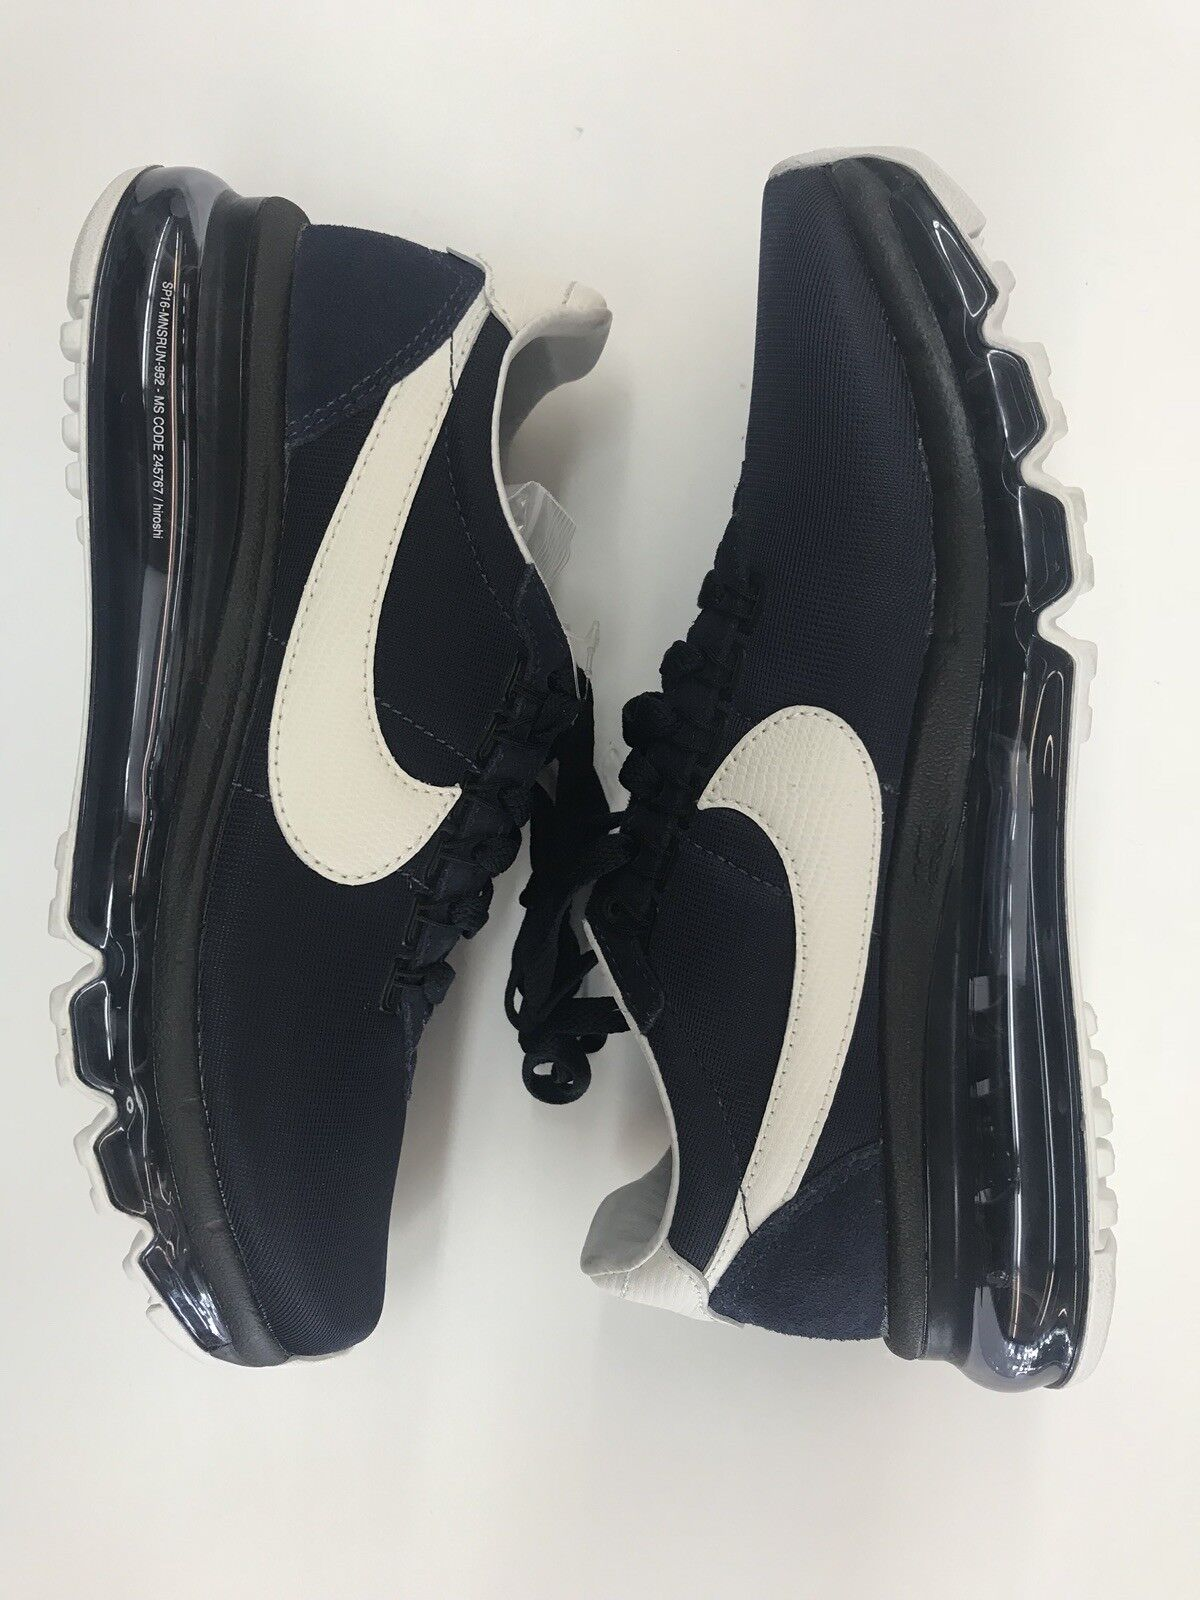 Nike Fujiwara Air Max LD-Zero HTM Hiroshi Fujiwara Nike (848624-410) Mens Size 4.5 918955